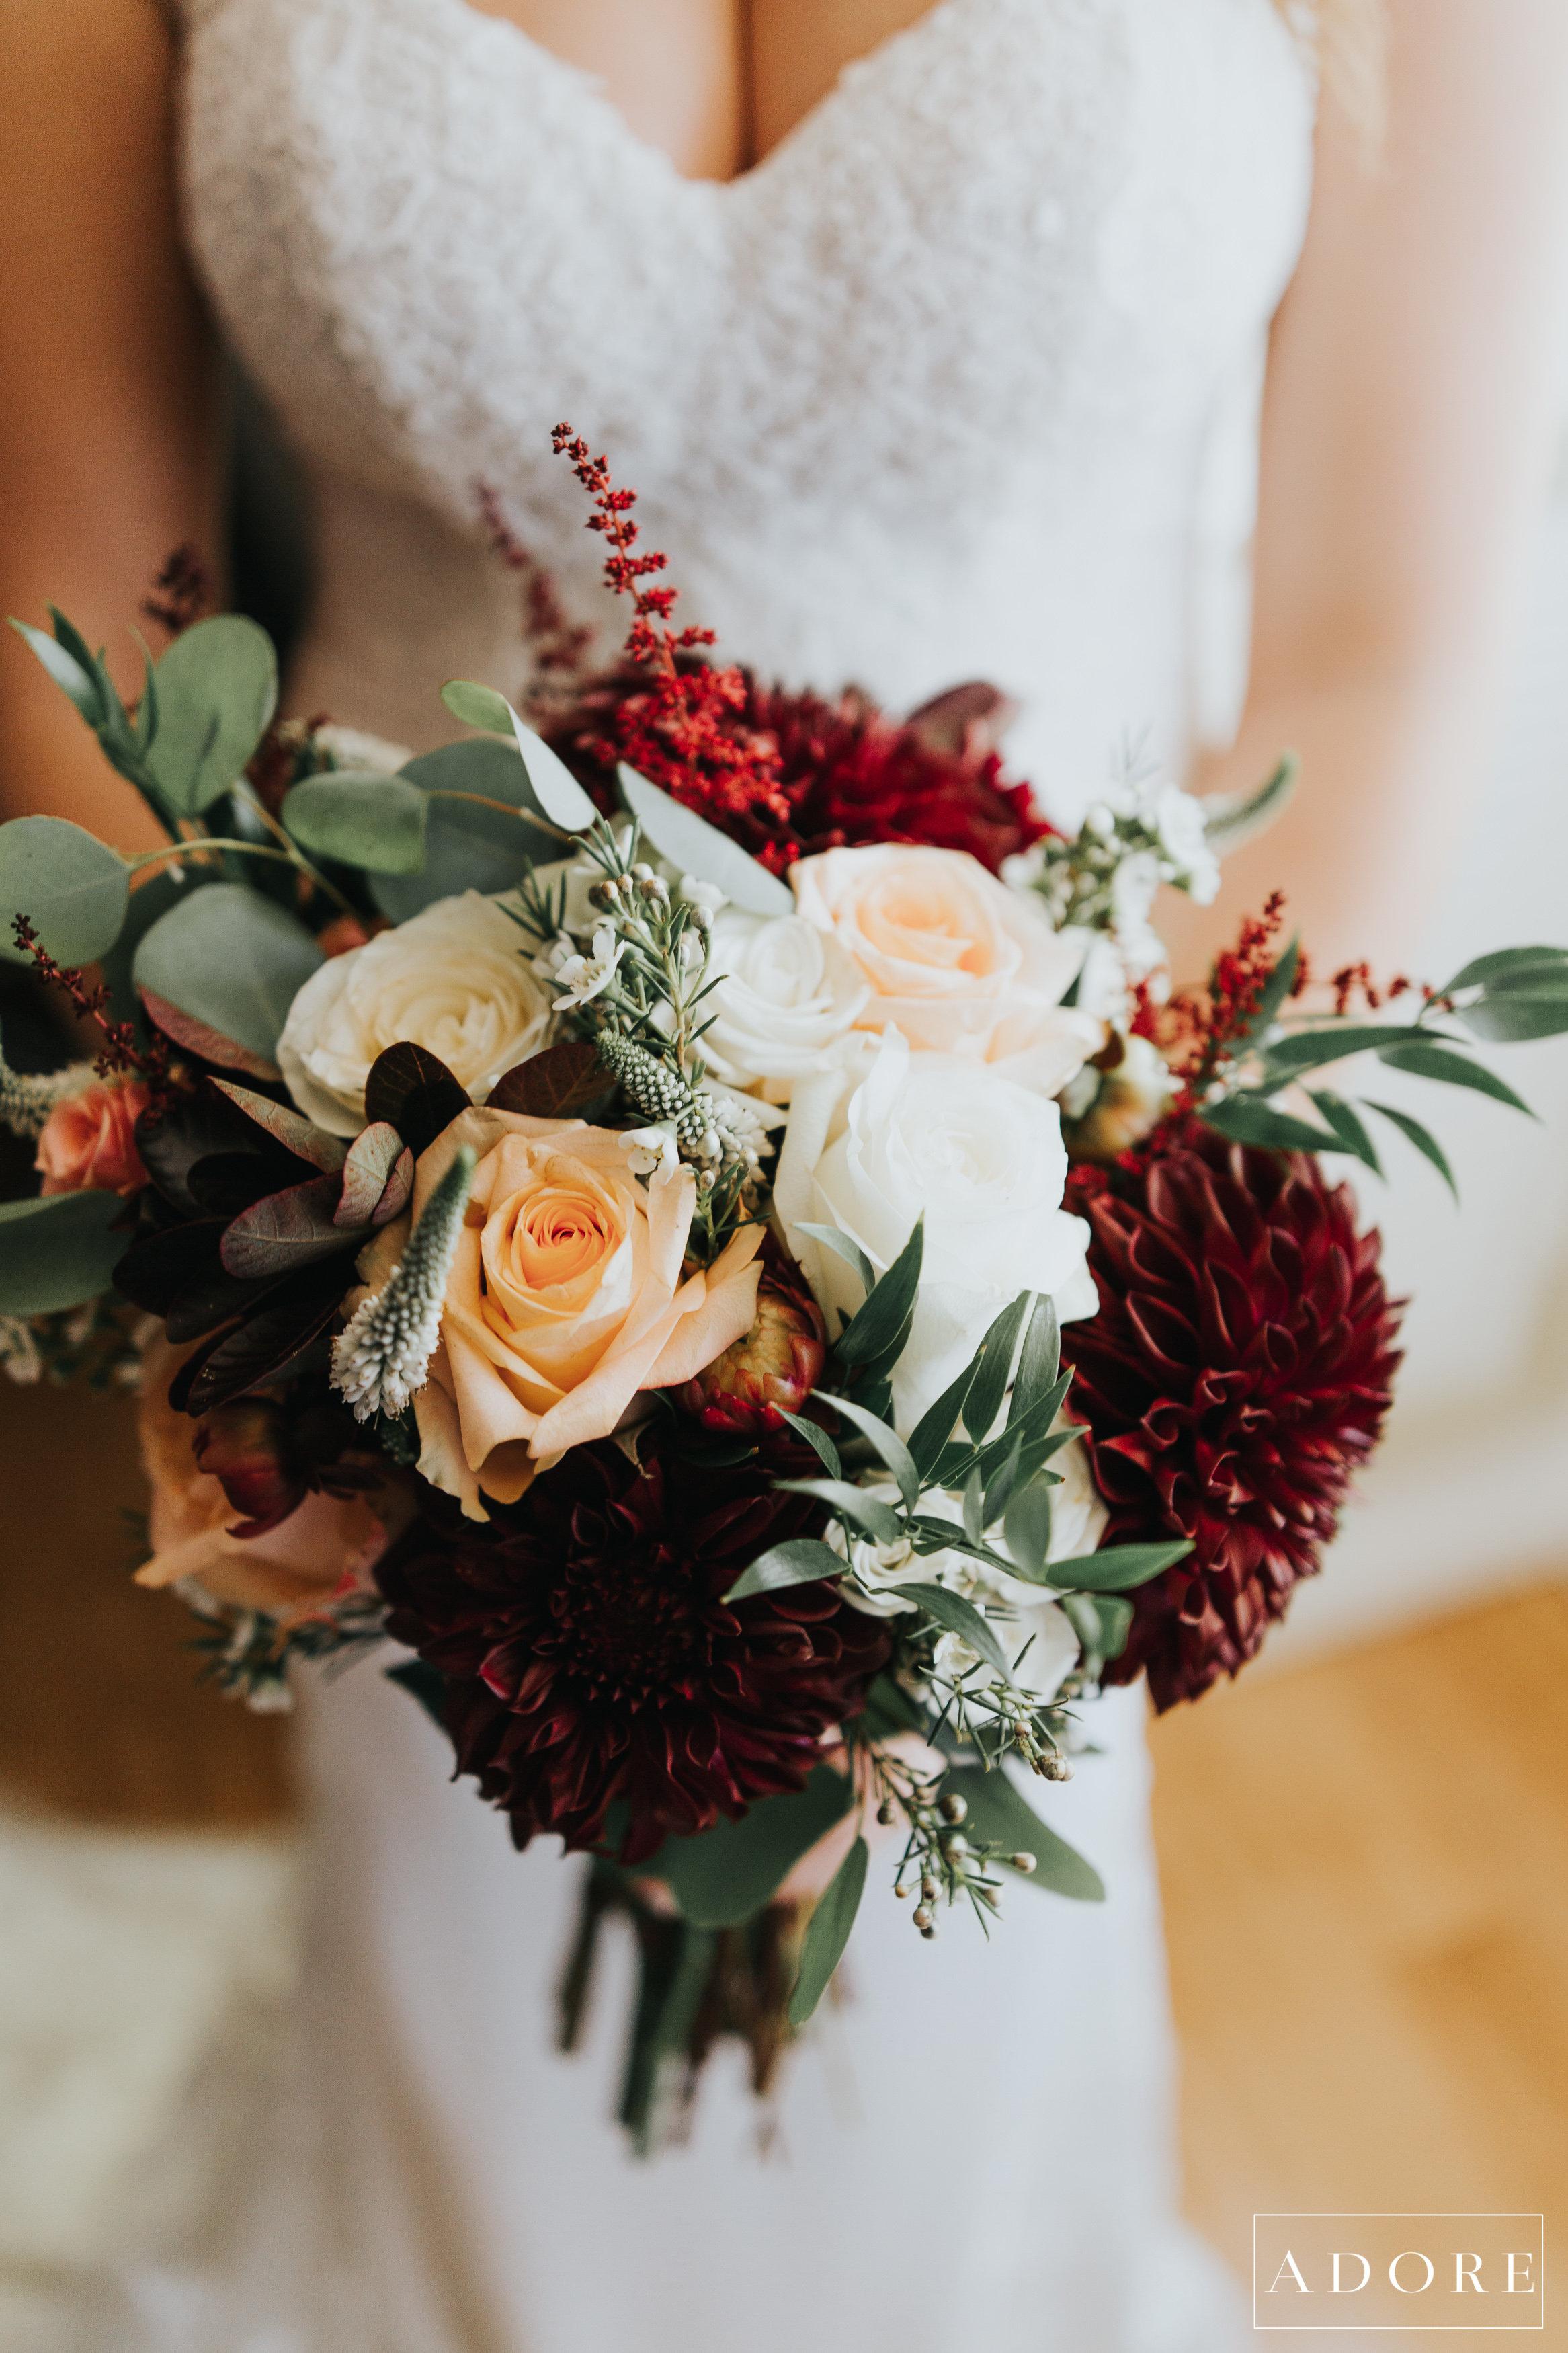 Adore Wedding Photography-15021.jpg